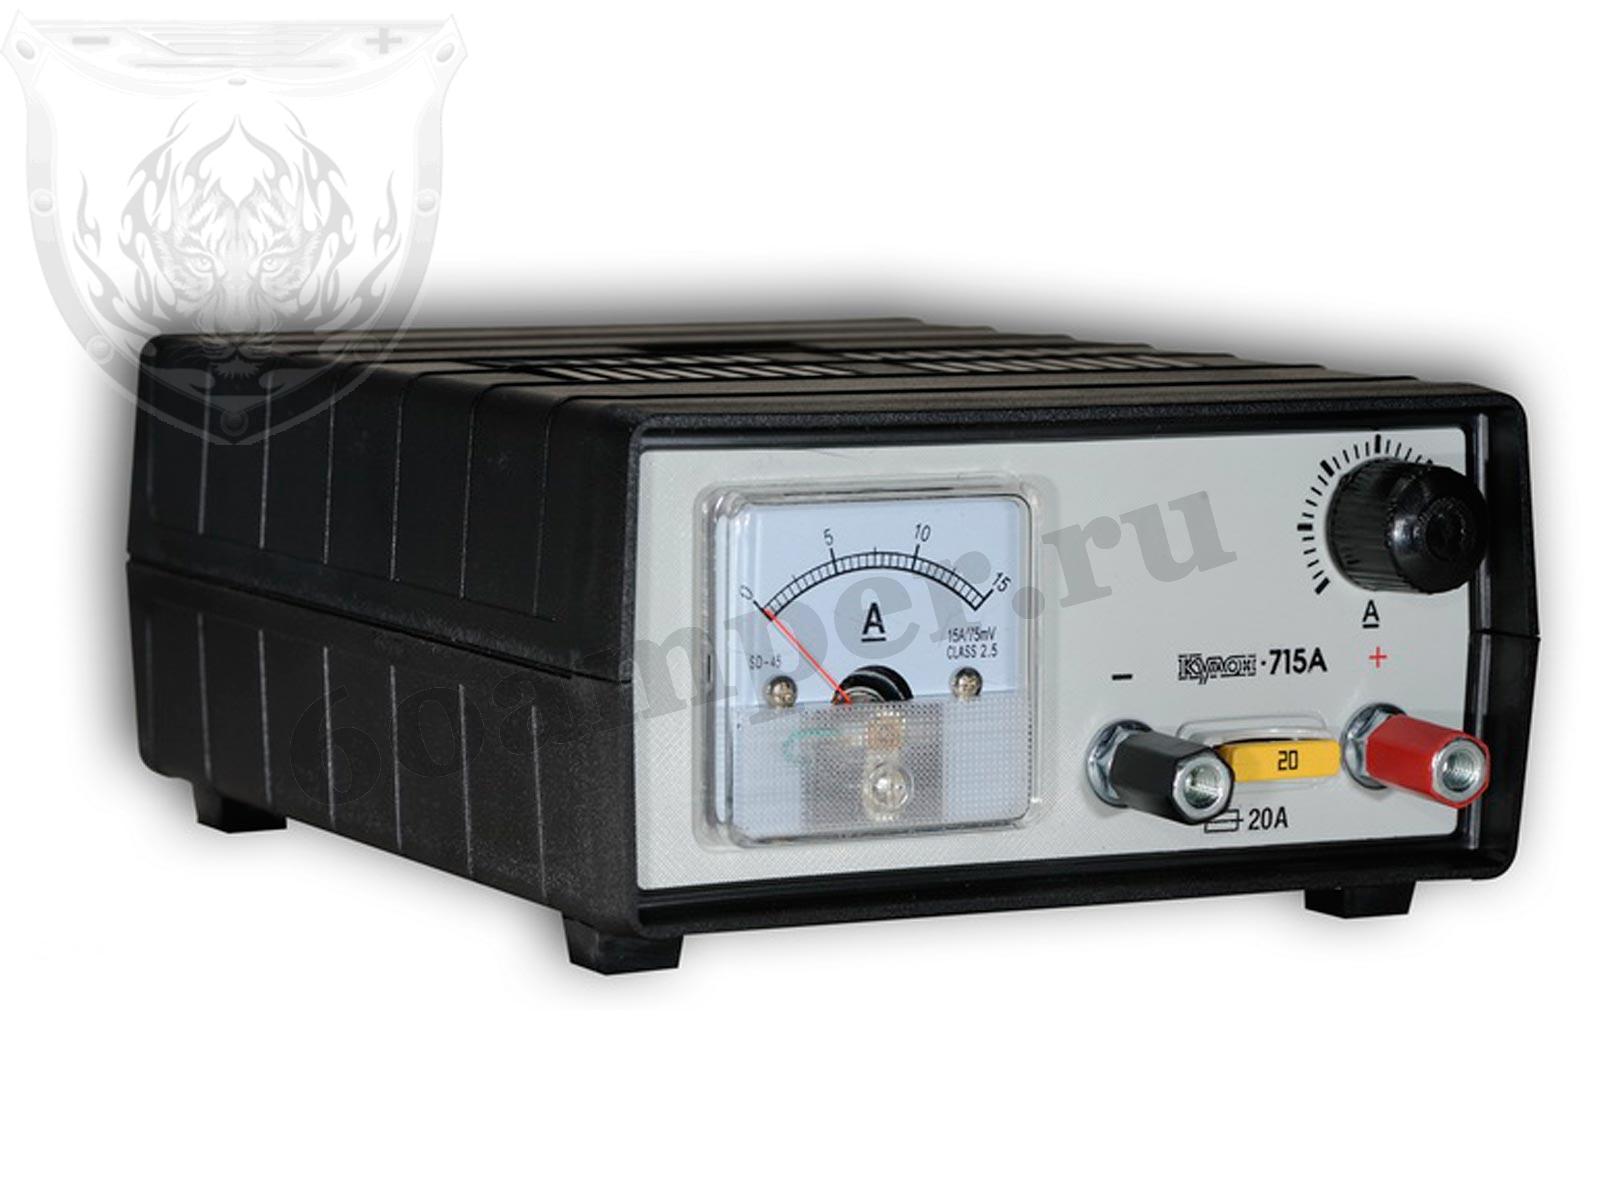 Кулон 715 A (стрелочный индикатор) ток заряда до 15А